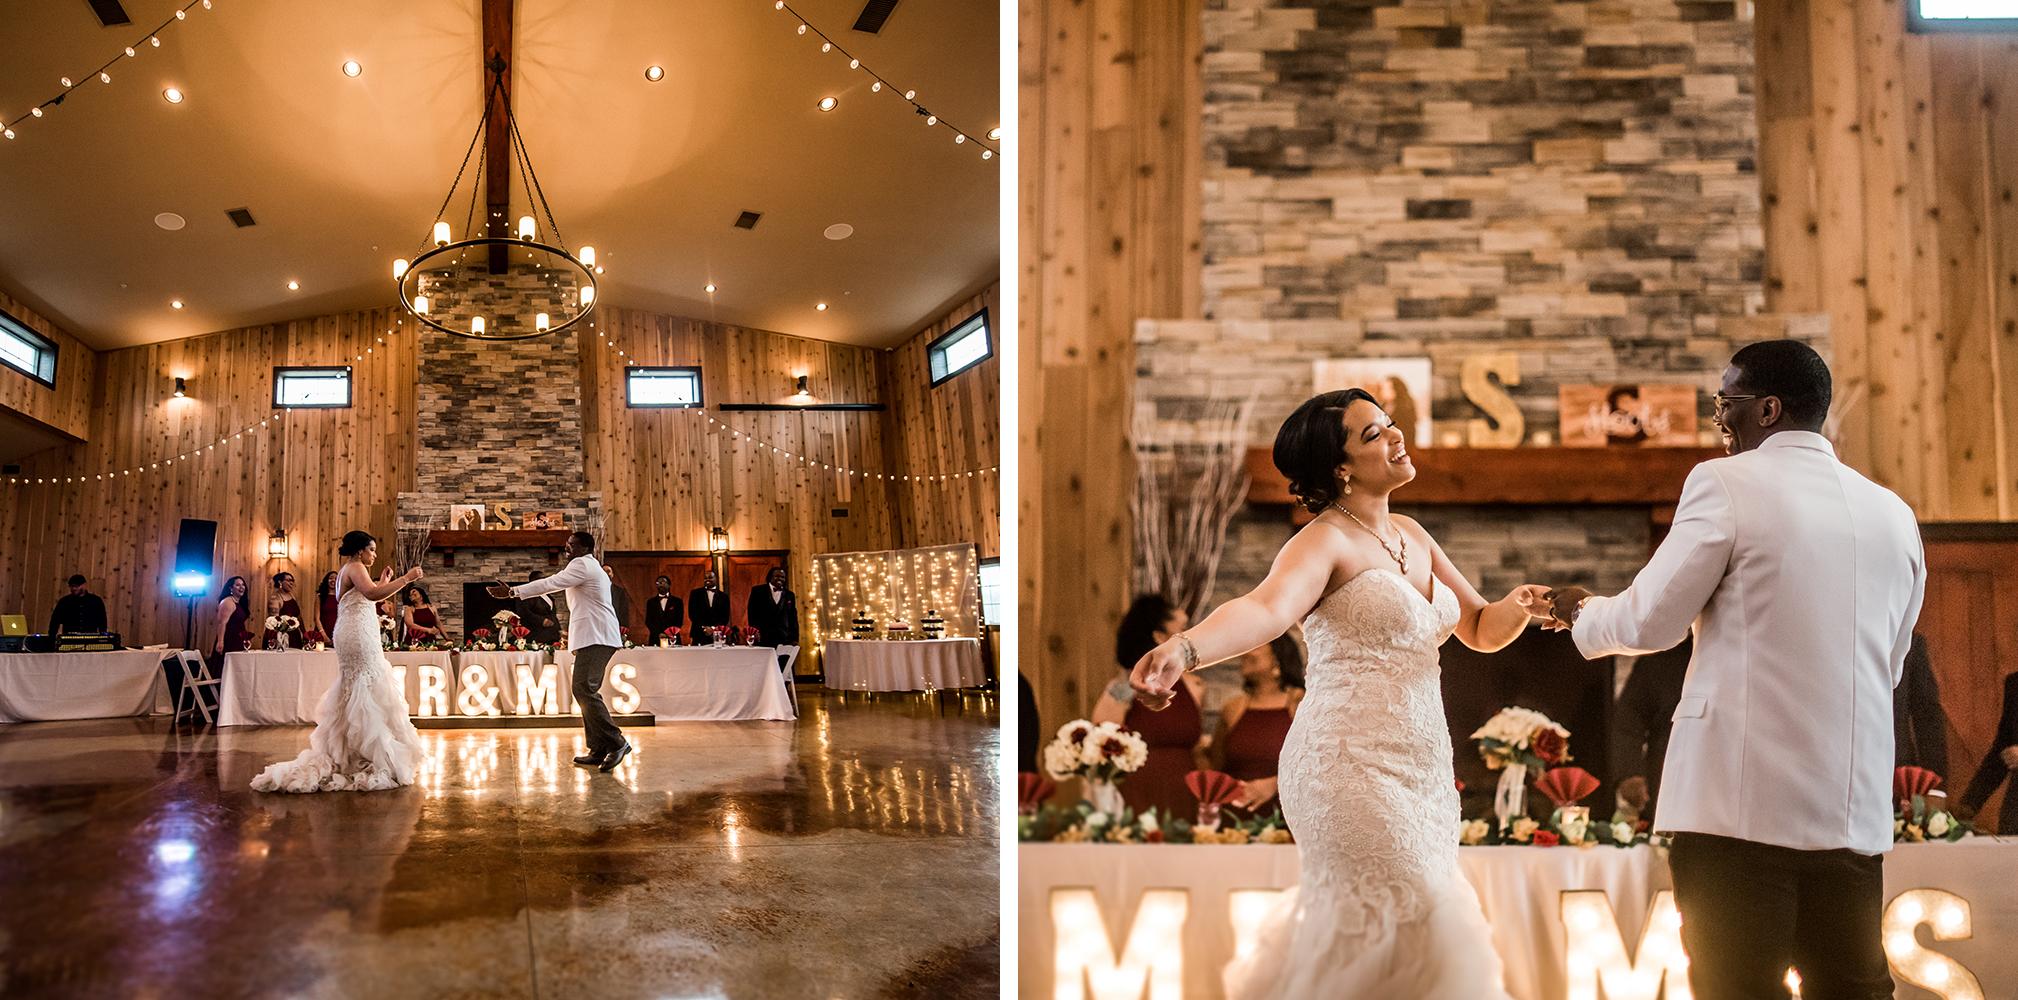 Burlington Iowa Wedding Midwest Photographer Melissa Cervantes _ Chantelle and Isaiah 1164.jpg